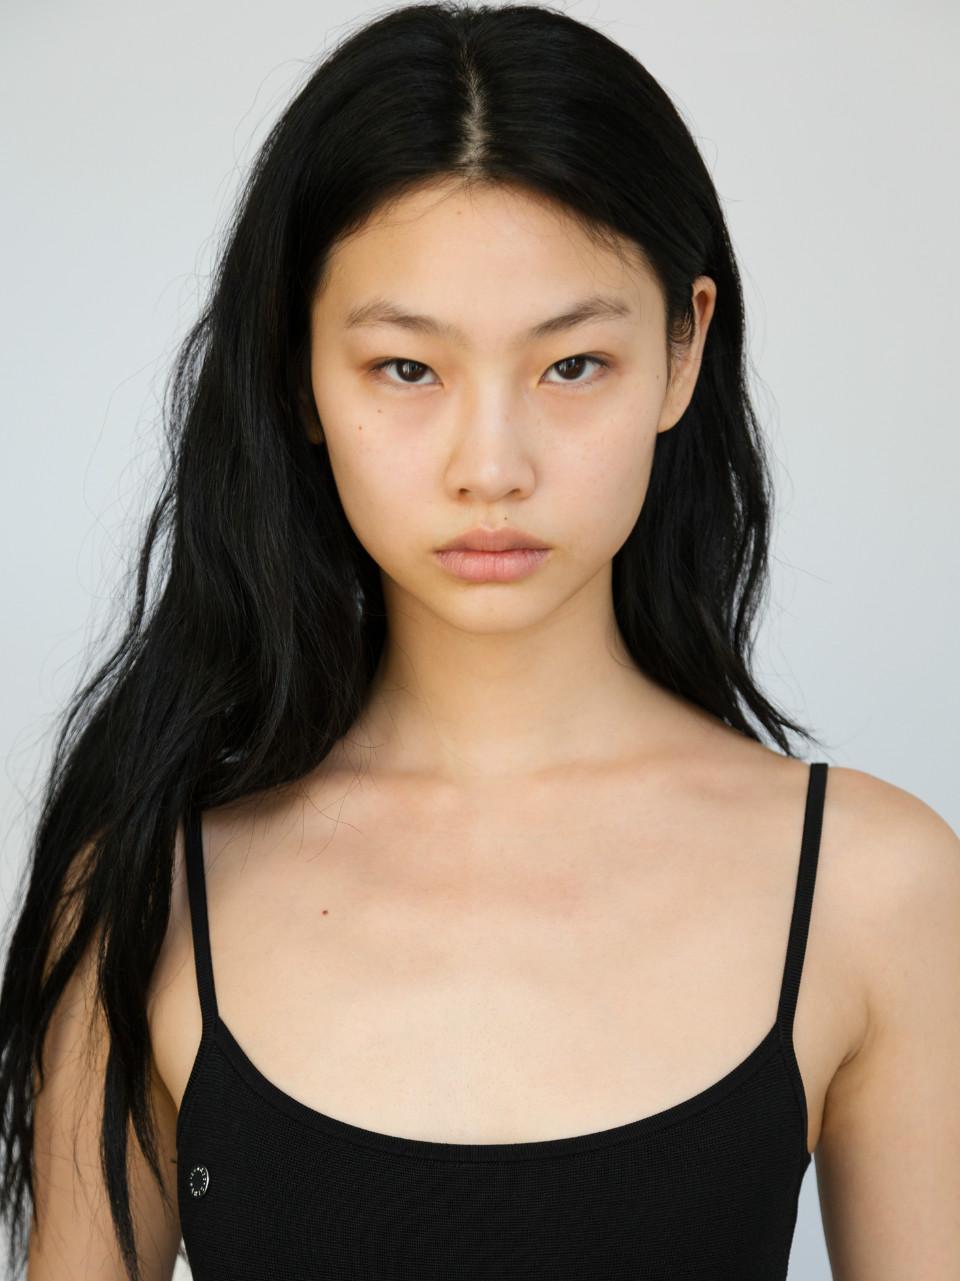 model, jung hoyeon, and hoyeon jung image